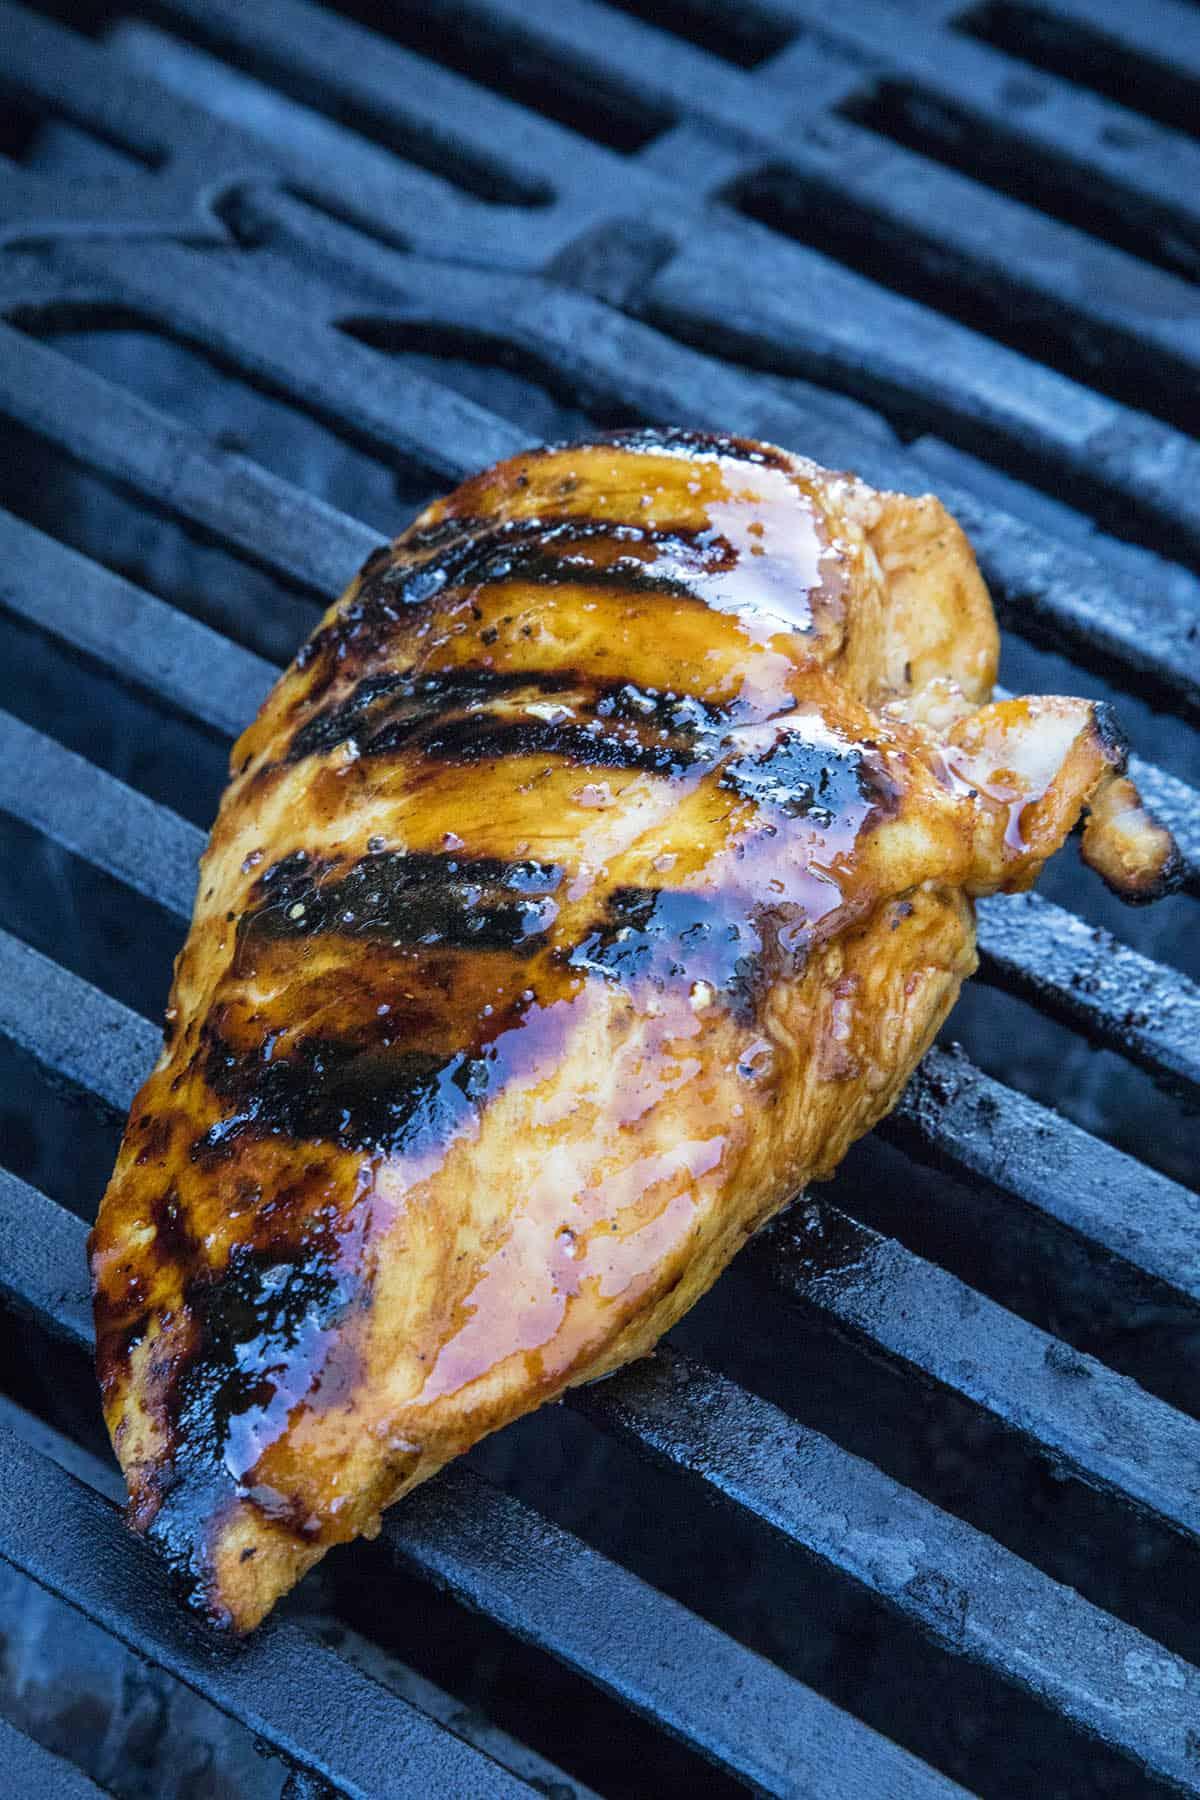 Honey Sriracha Chicken on the grill